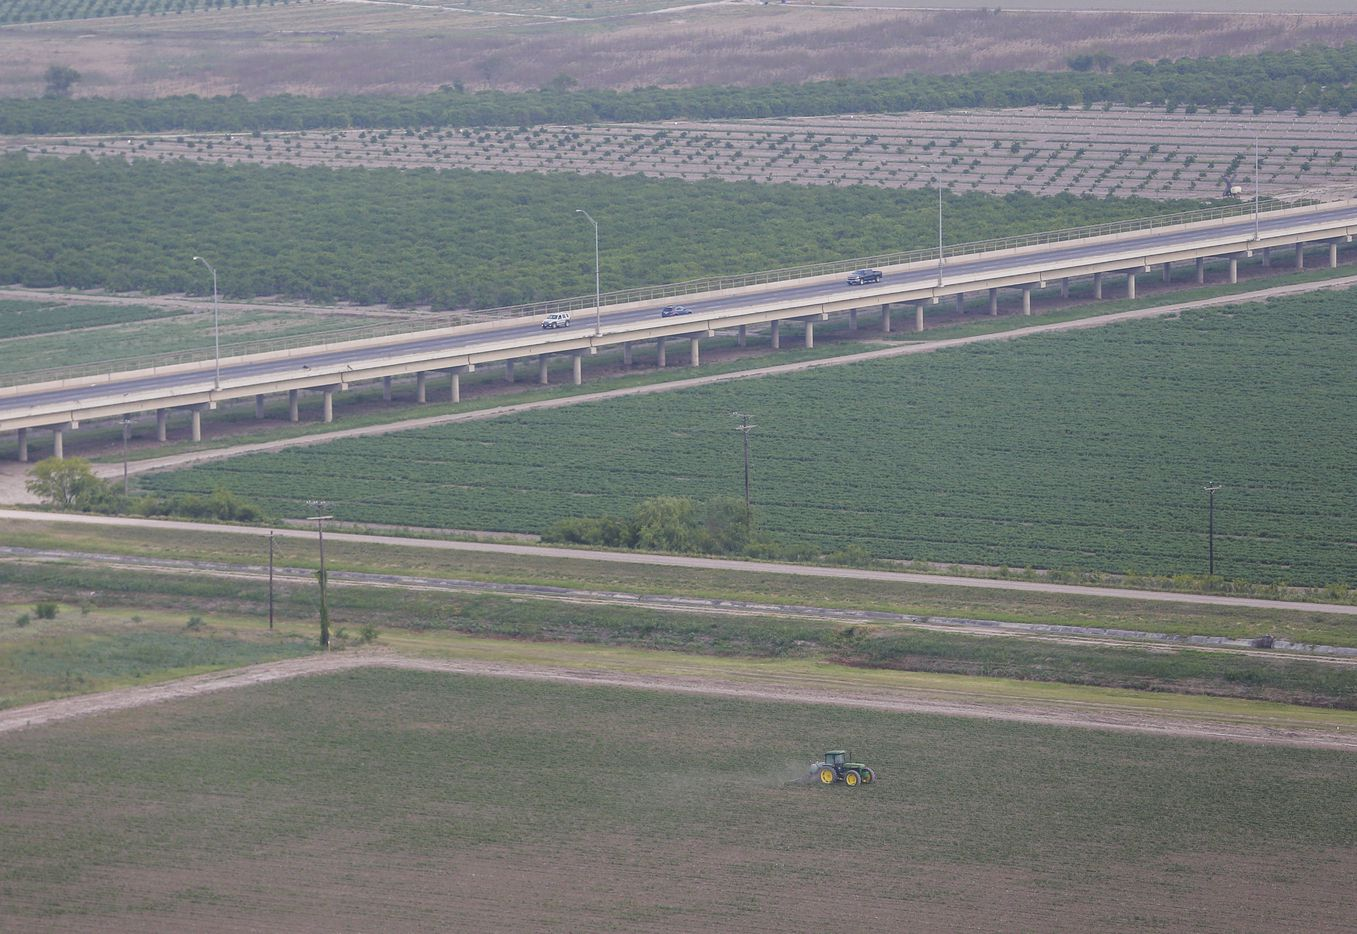 The Pharr International Bridge